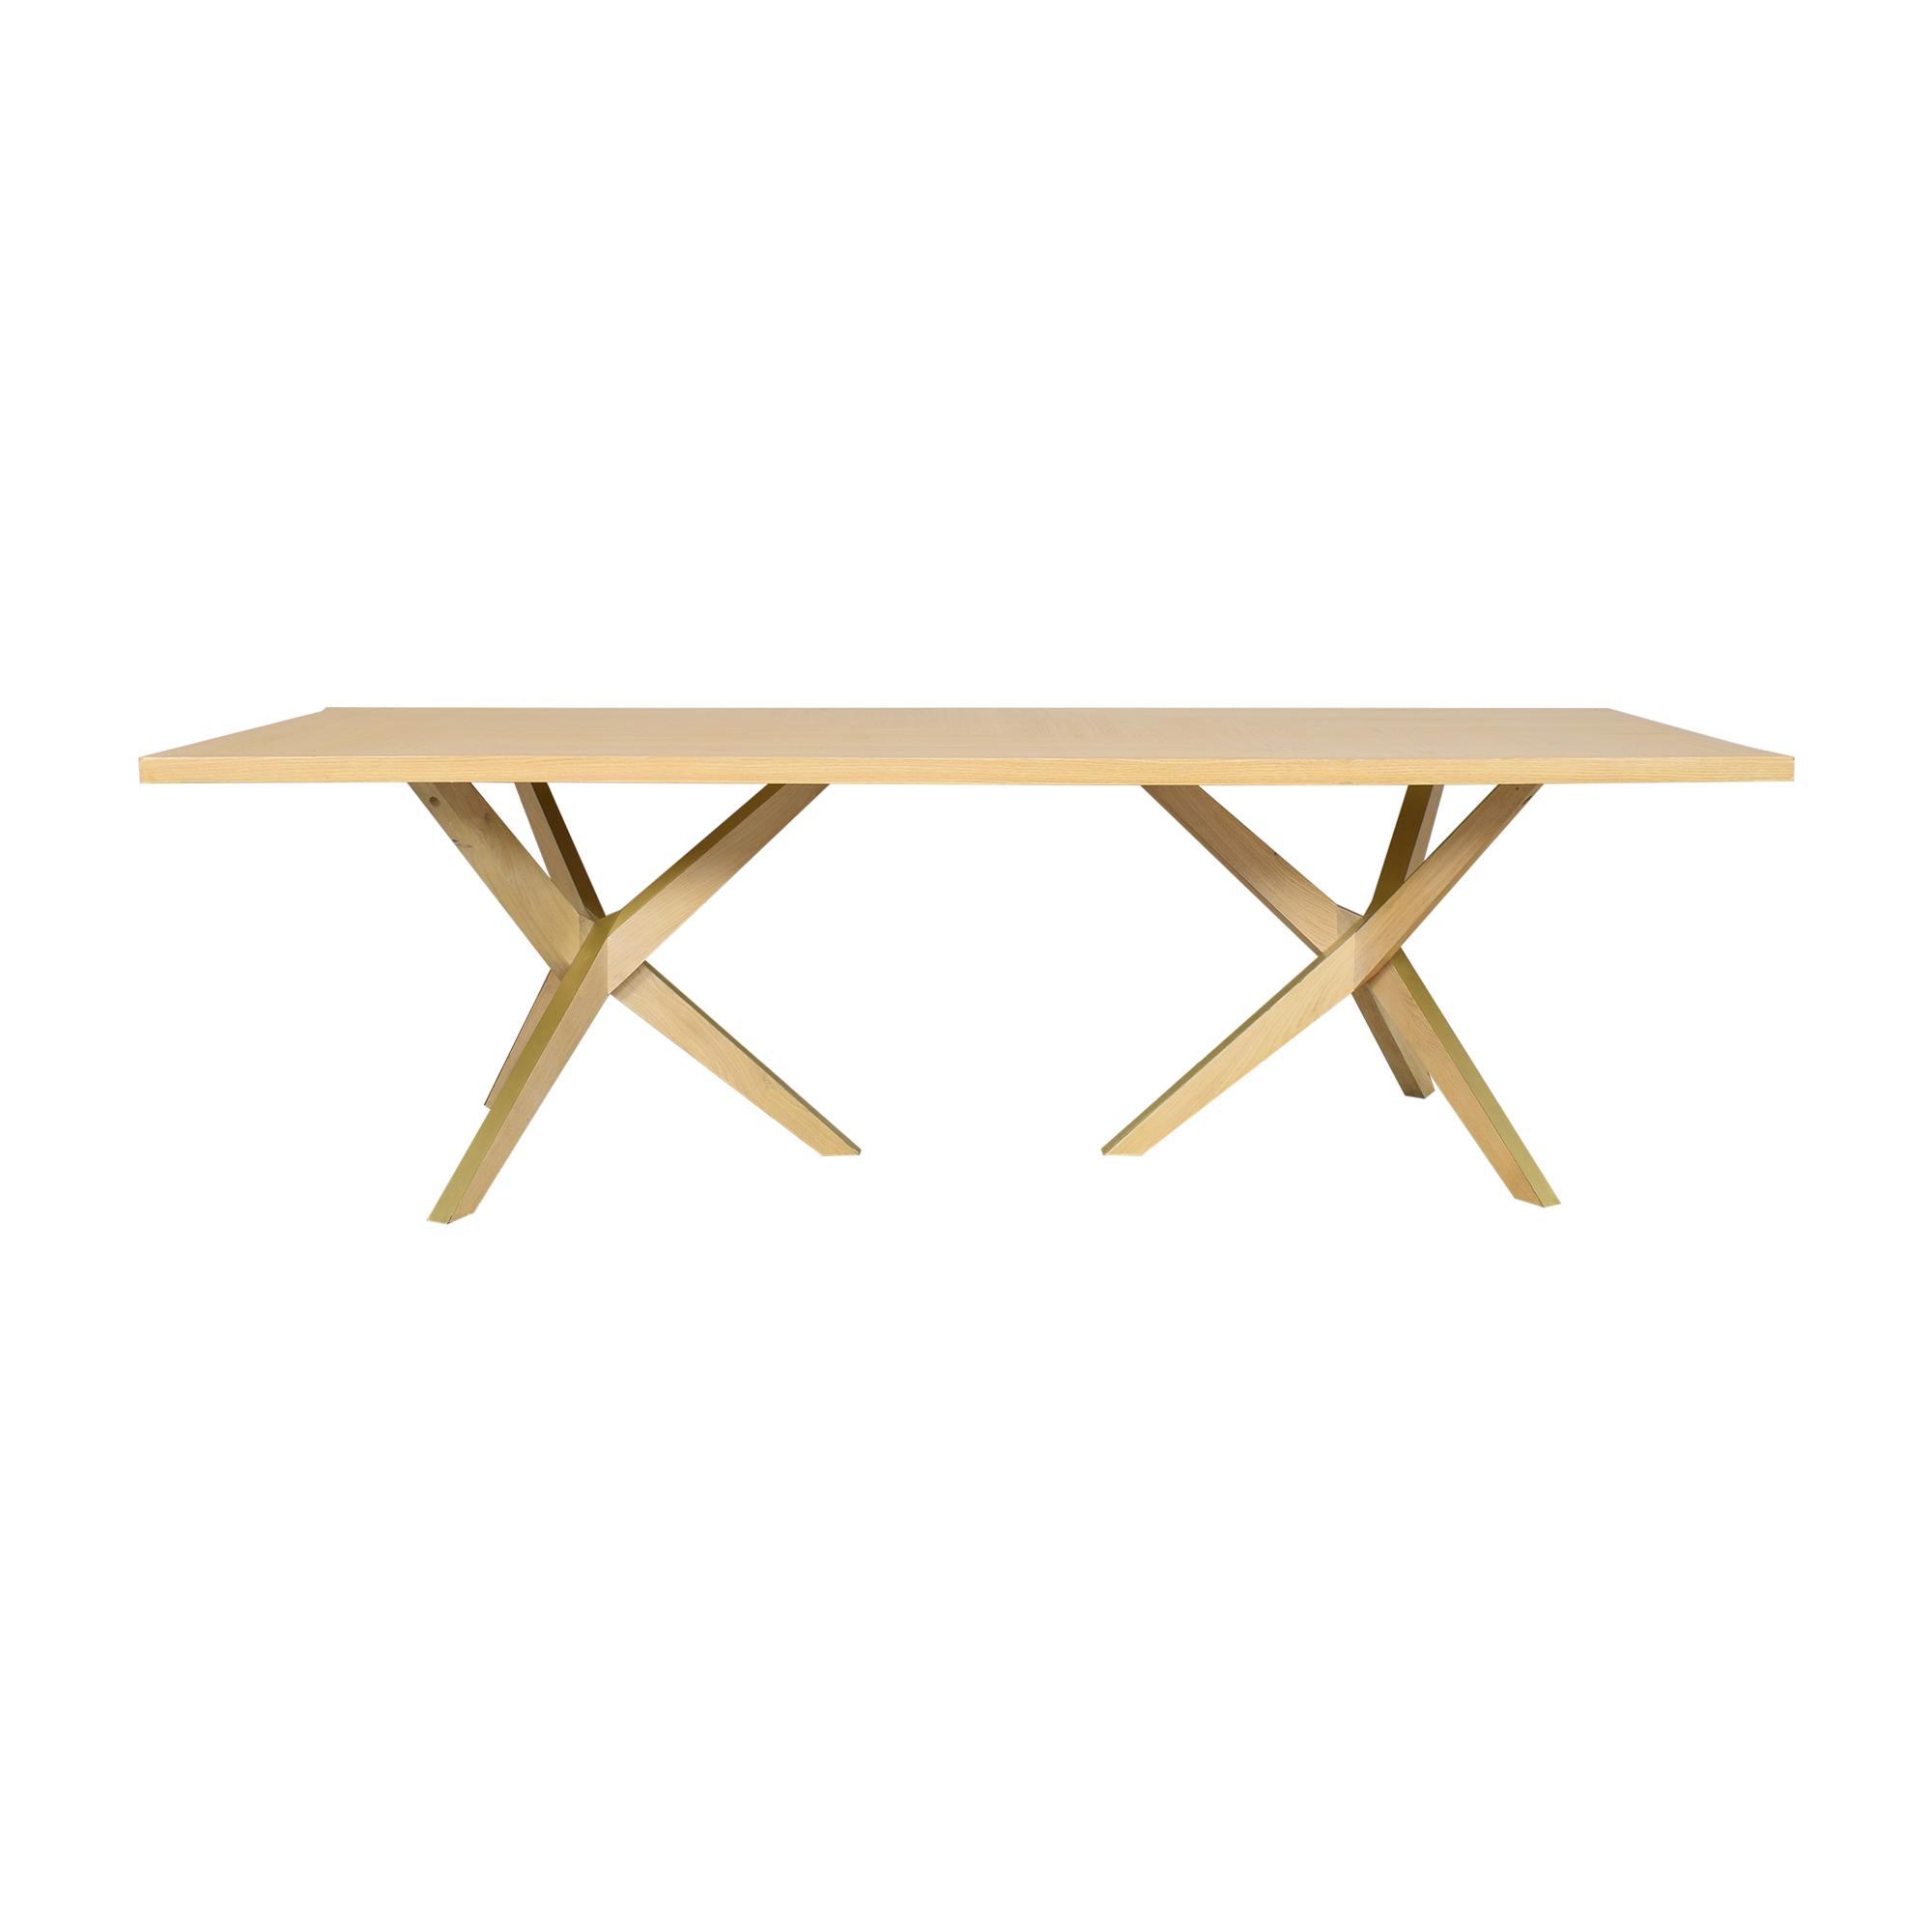 Roche Bobois Roche Bobois Jane Dining Table for sale